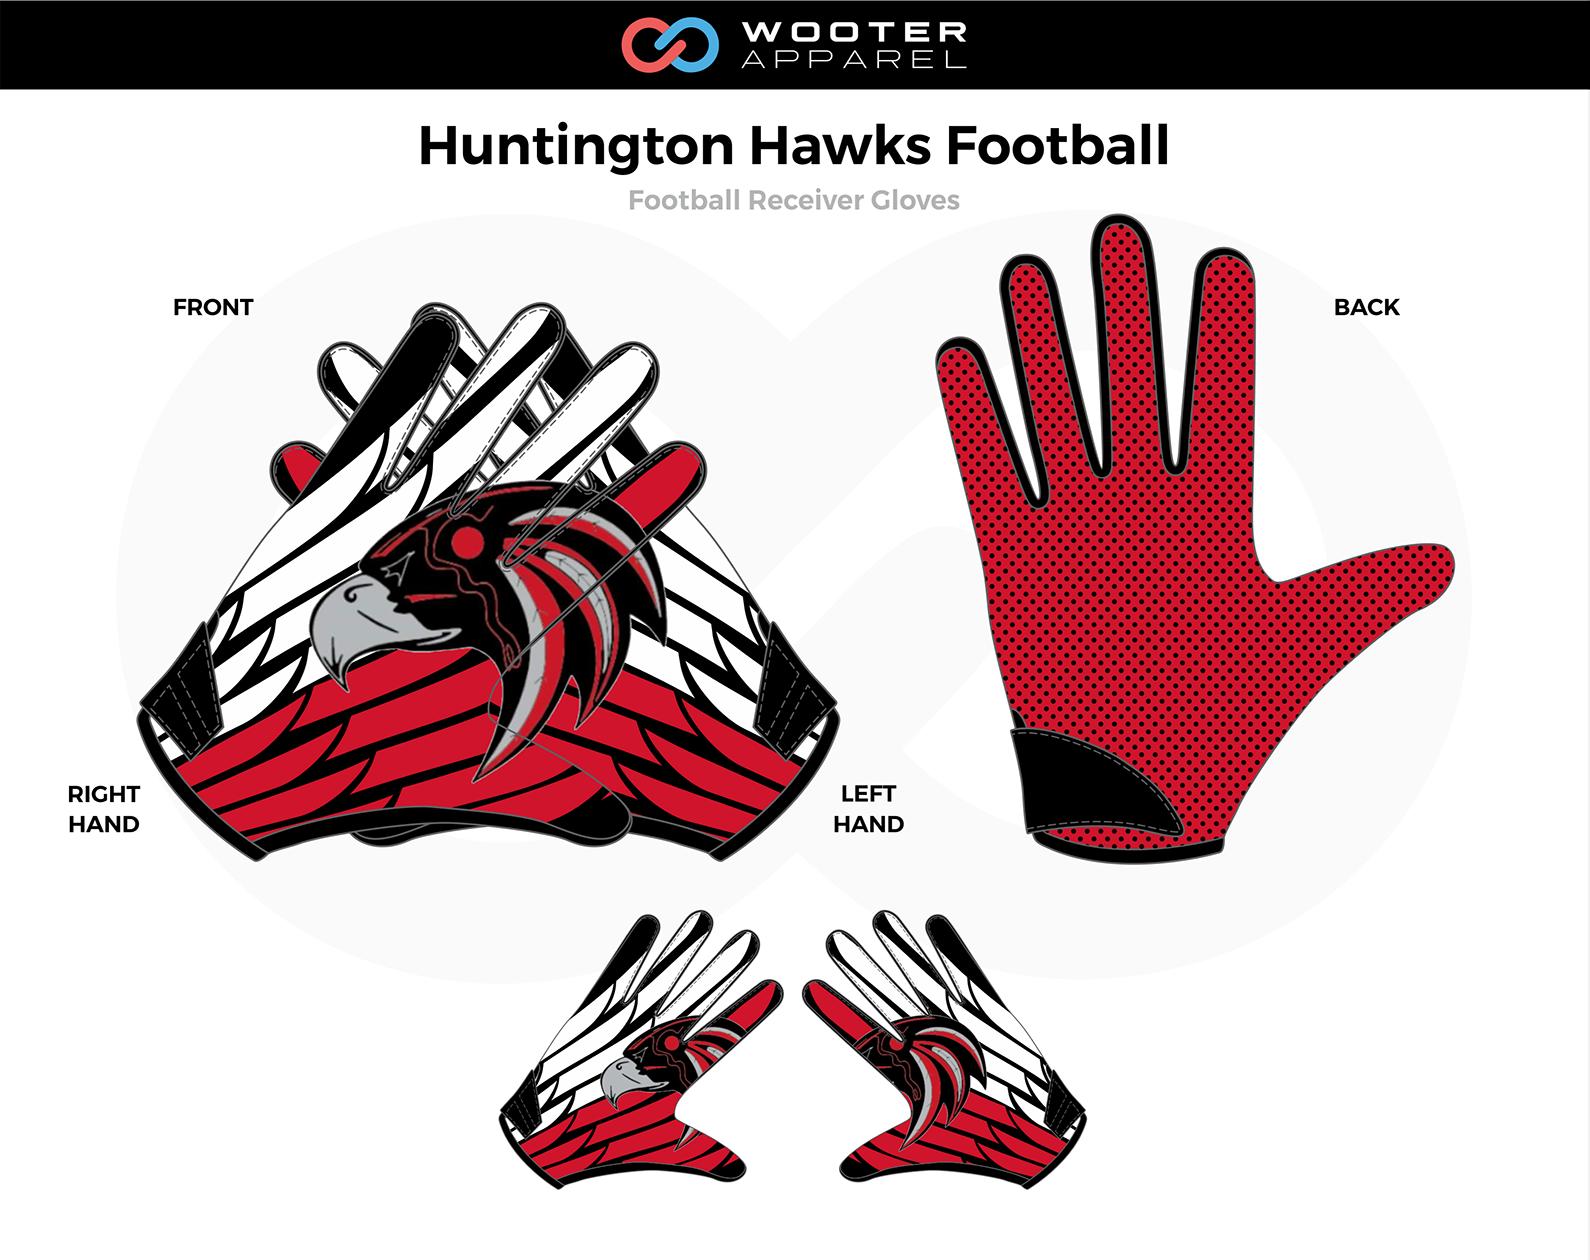 HHF003 - Huntington Hawks Football Gloves.png